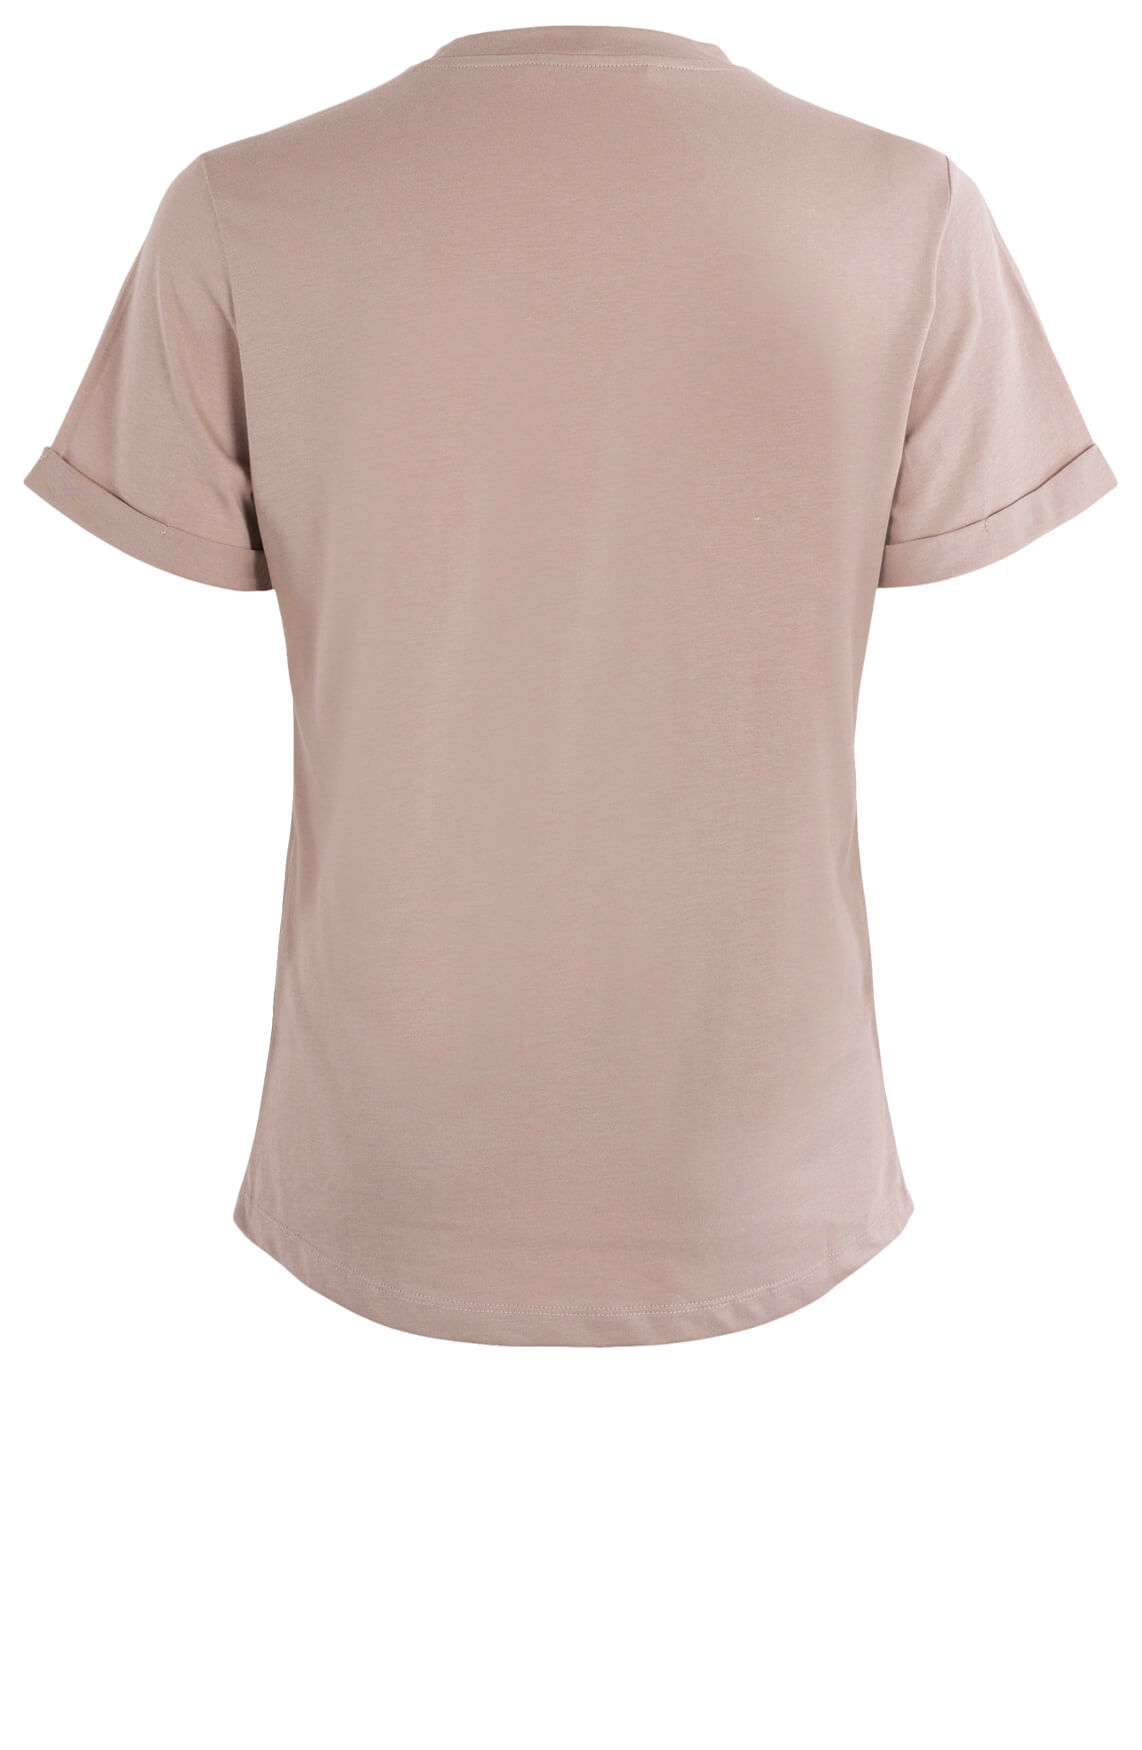 Moscow Dames Shirt Gone Bruin